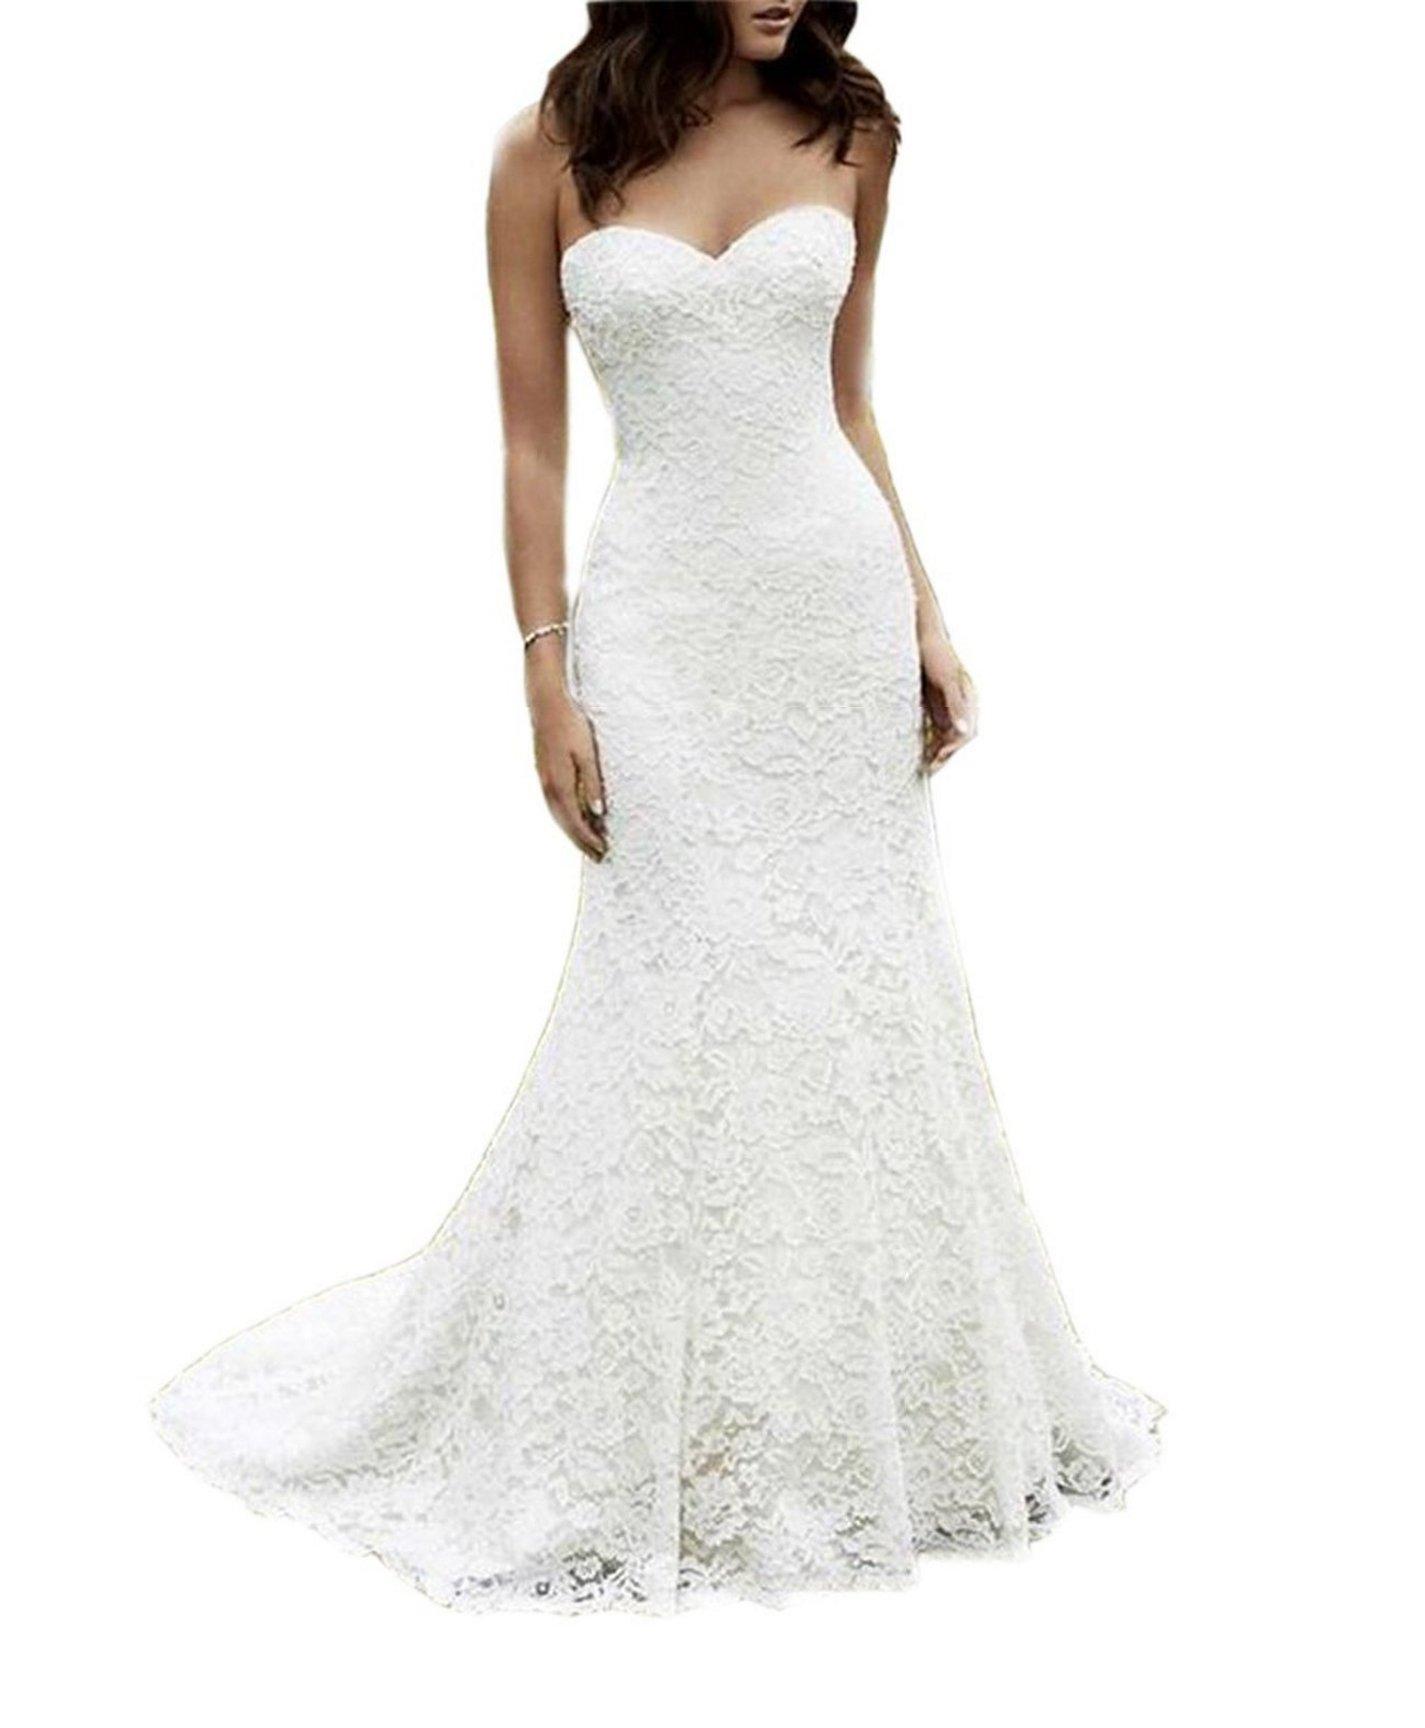 Tsbridal Women Wedding Dresses A-line V-Neck Tulle Lace Backless Boho Wedding Gown Bridal Dresses